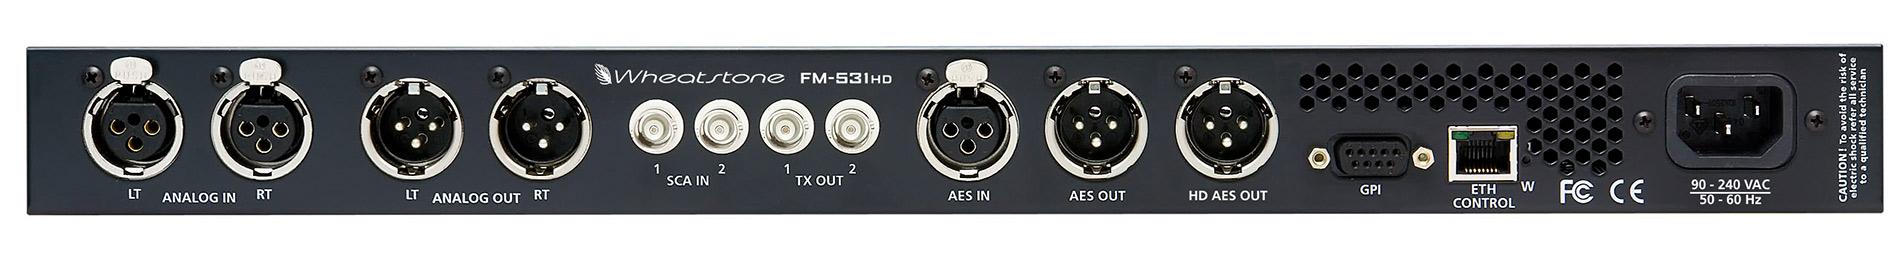 FM-531HD: tył